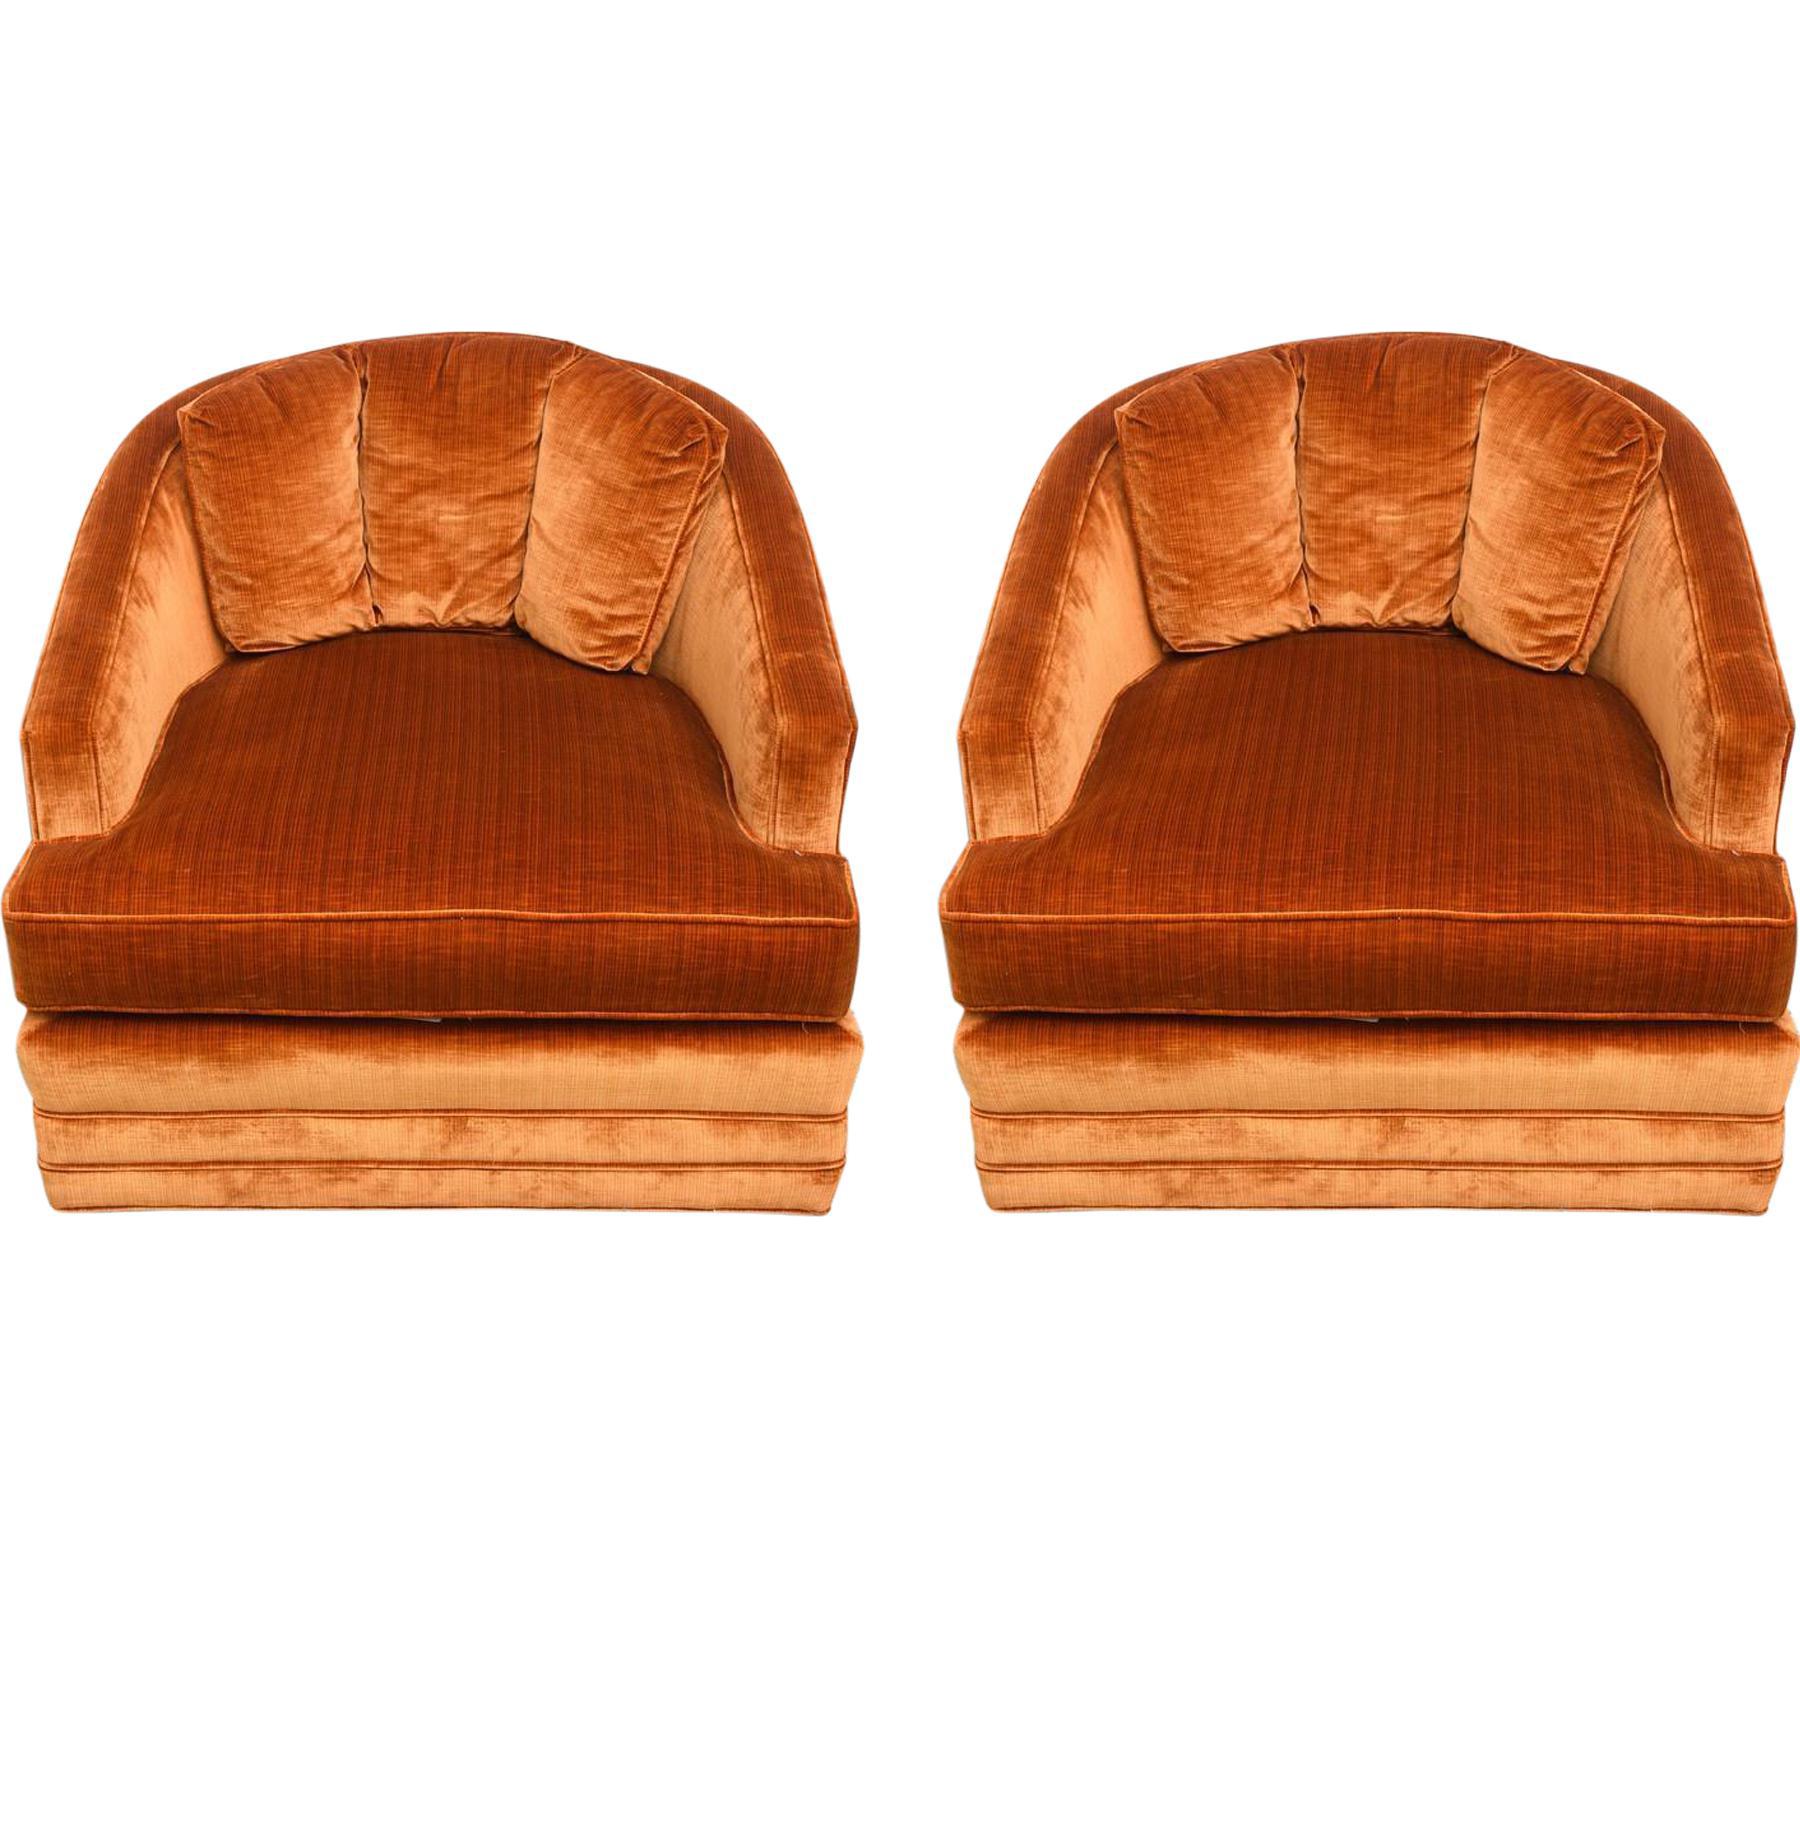 Distinguished Drexel Heritage Swivel Club Barrel Chairs 1960s USA